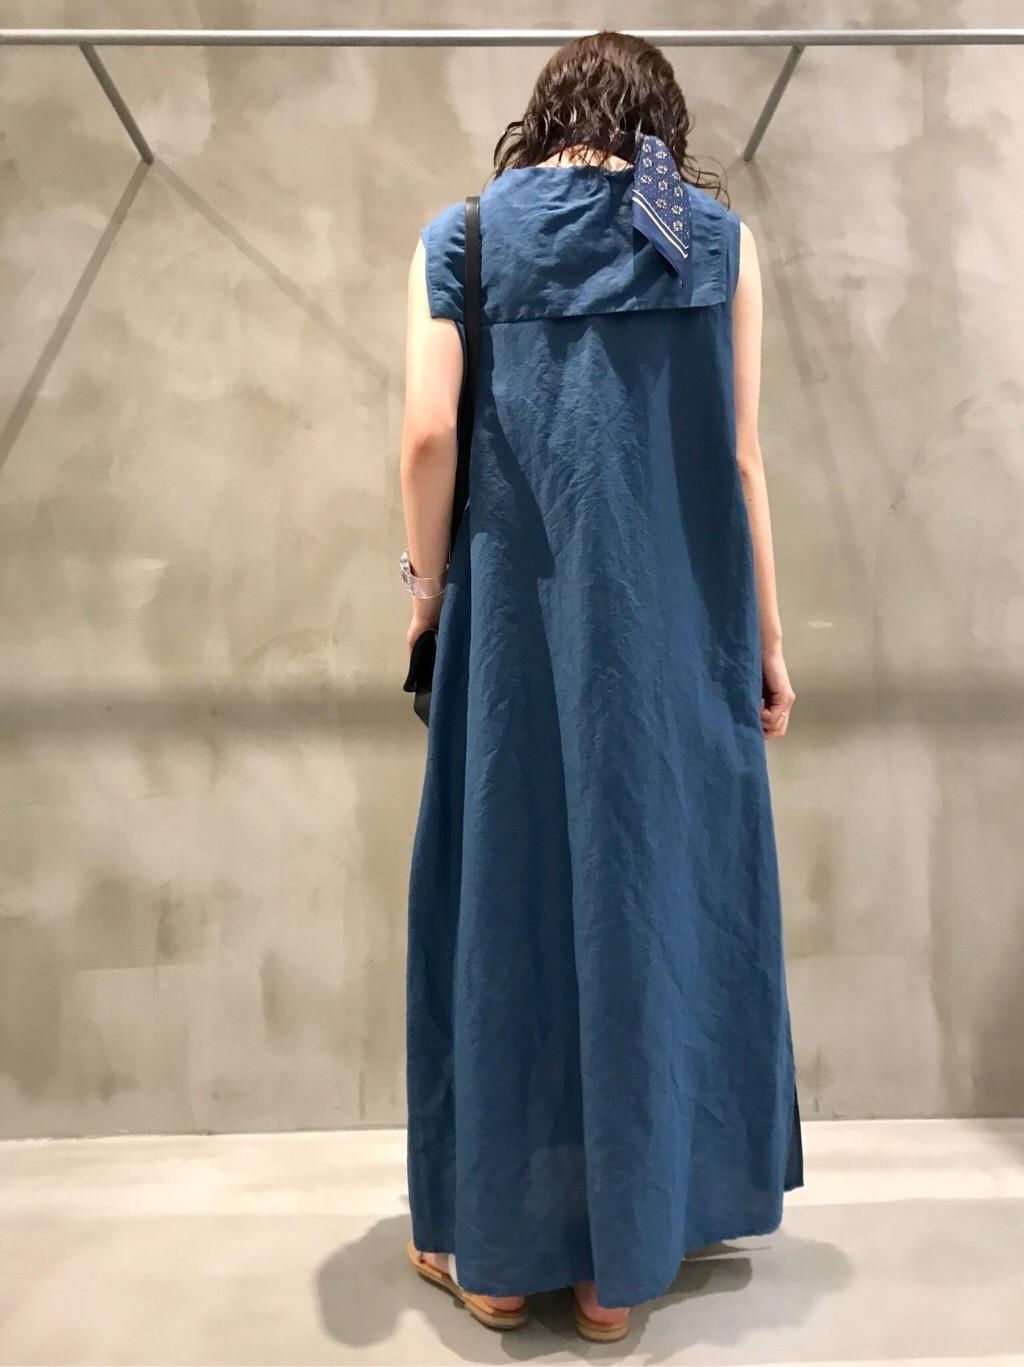 bulle de savon 渋谷スクランブルスクエア 身長:153cm 2020.08.20